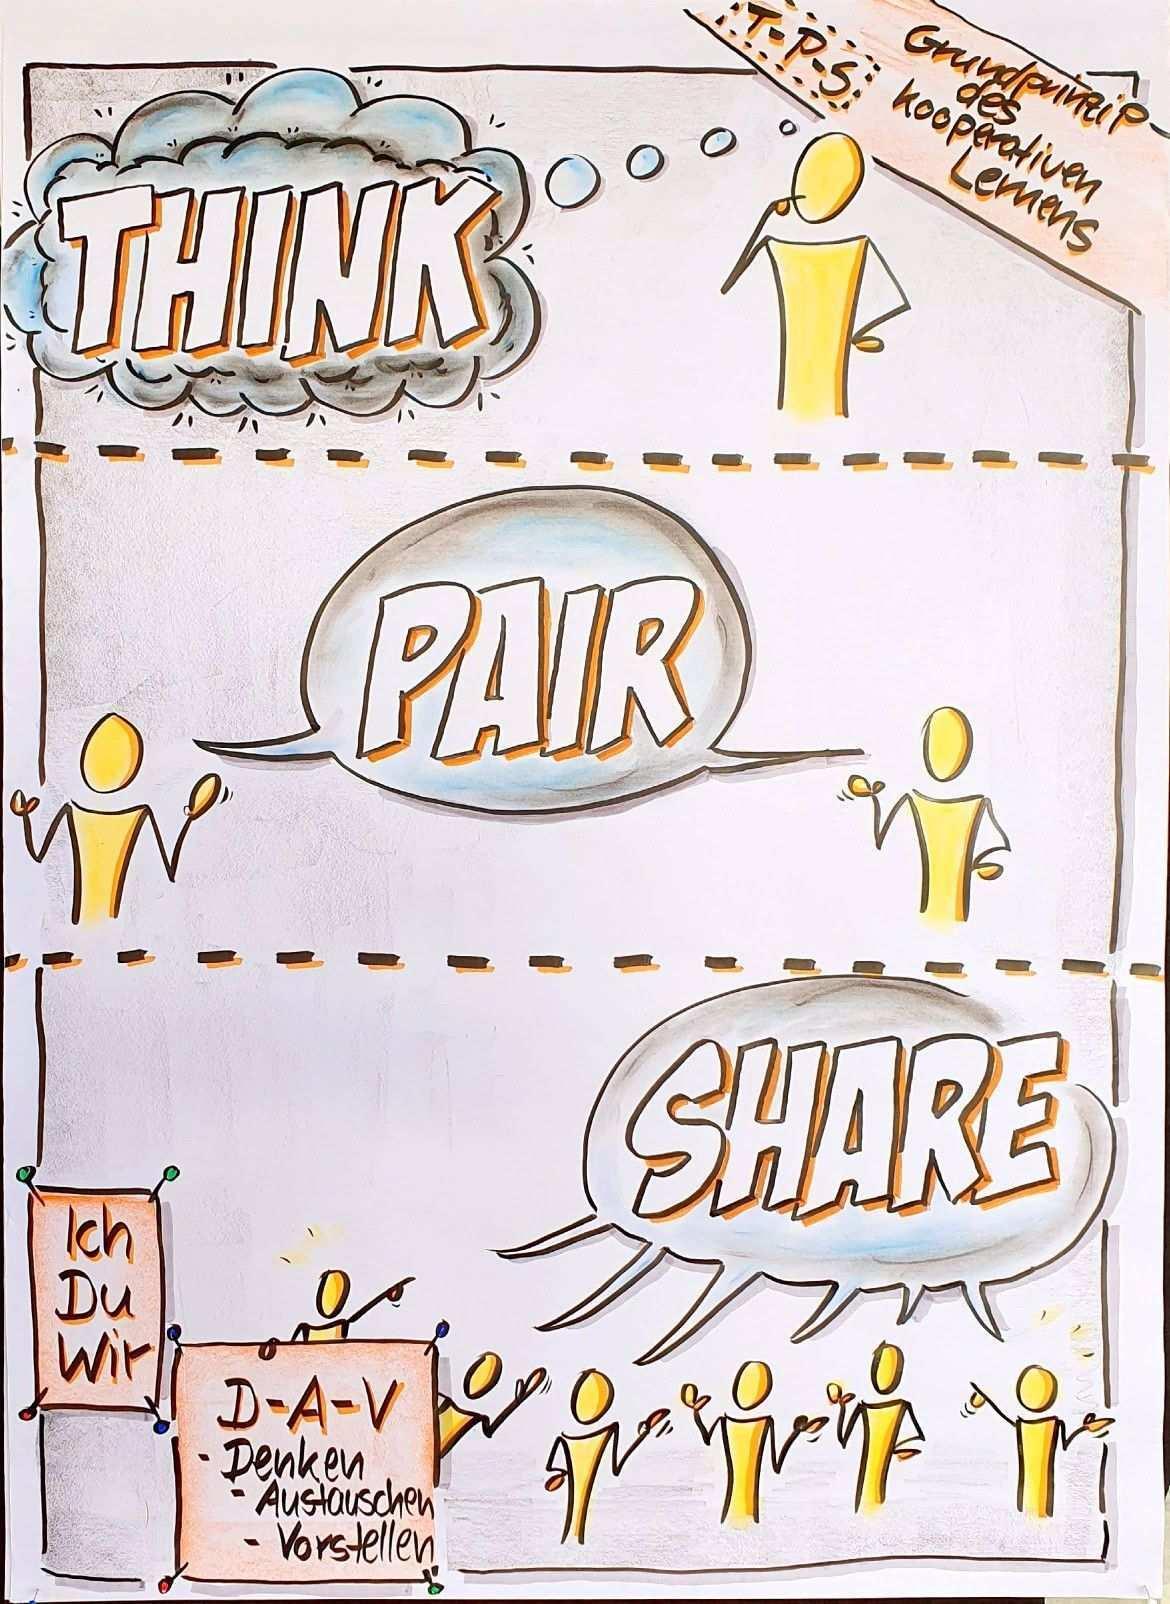 Flipchart Kooperativeslernen Methode Thinkpairshare Schule Seminar Www Angestiftet Com Bernd Schussele Sketch Notes Flip Chart Learning Methods